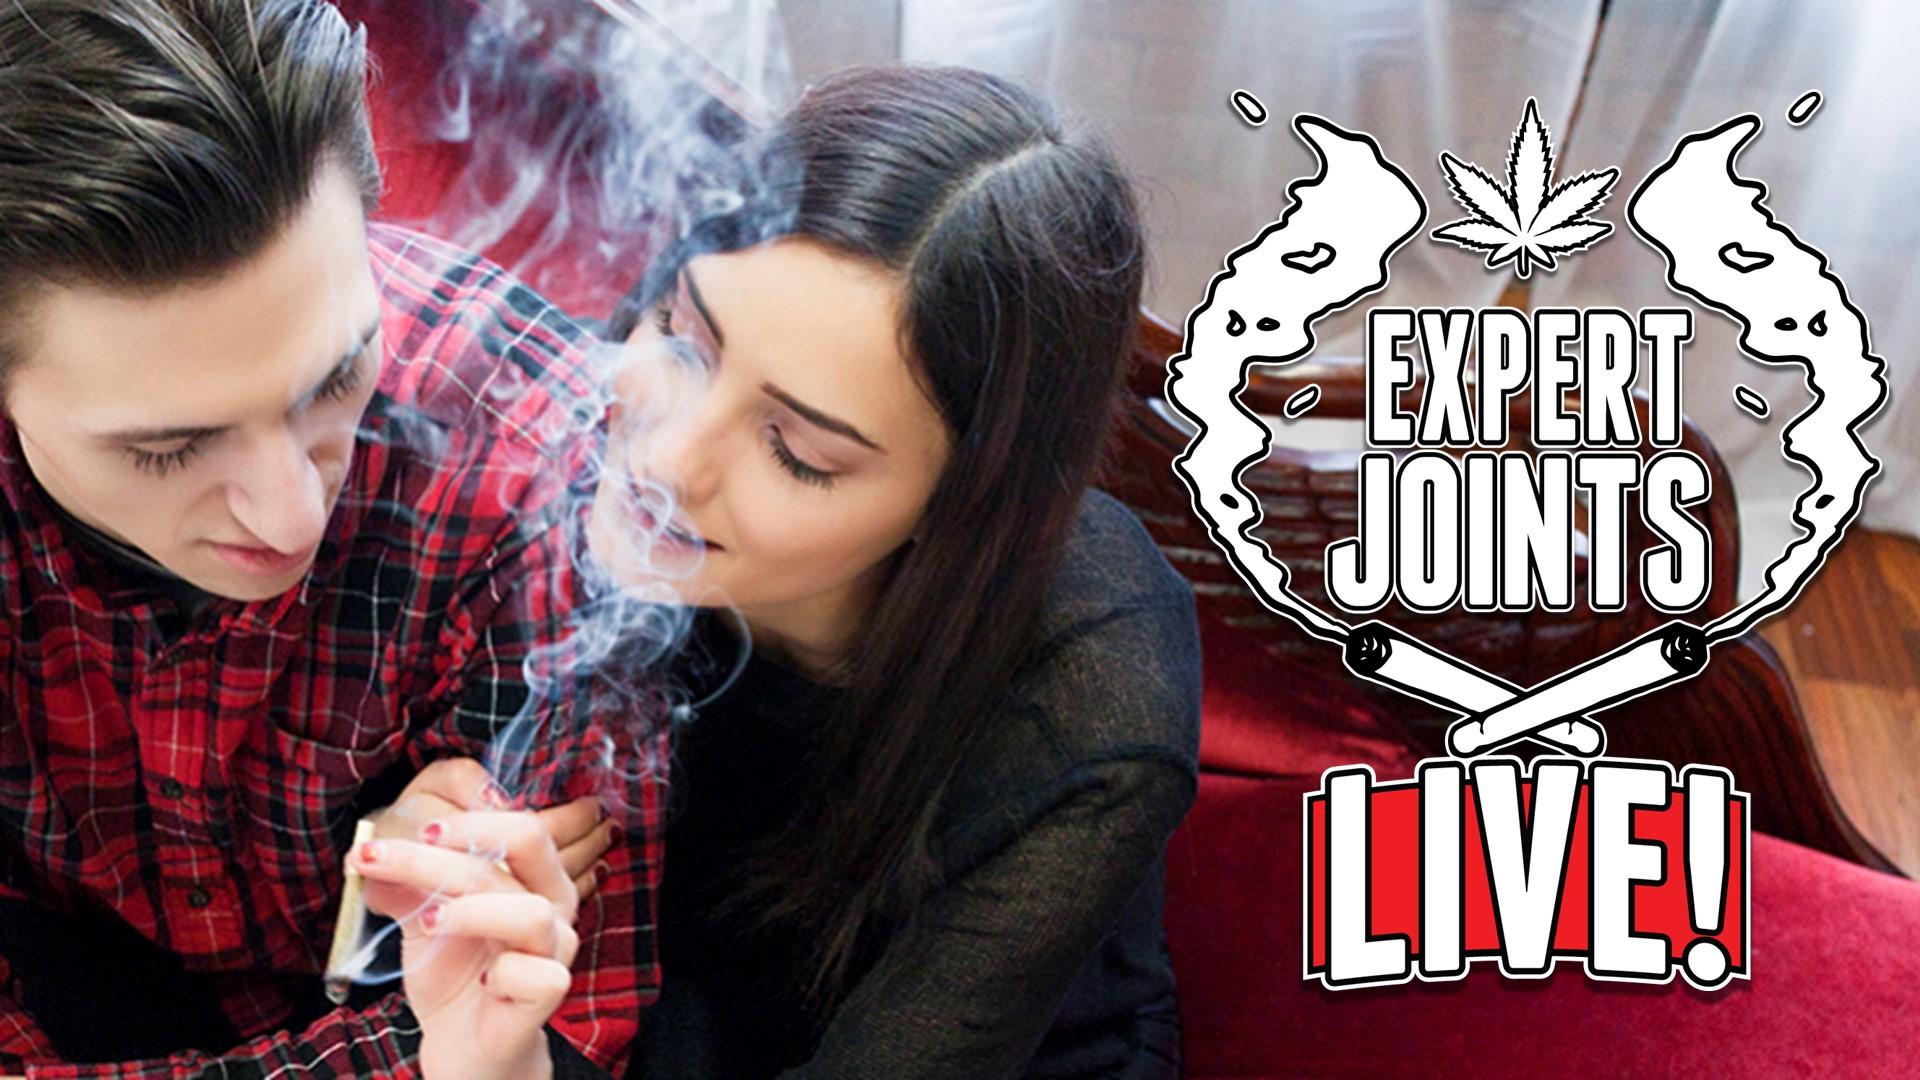 Expert Joints LIVE! on Pot TV: It's A Match